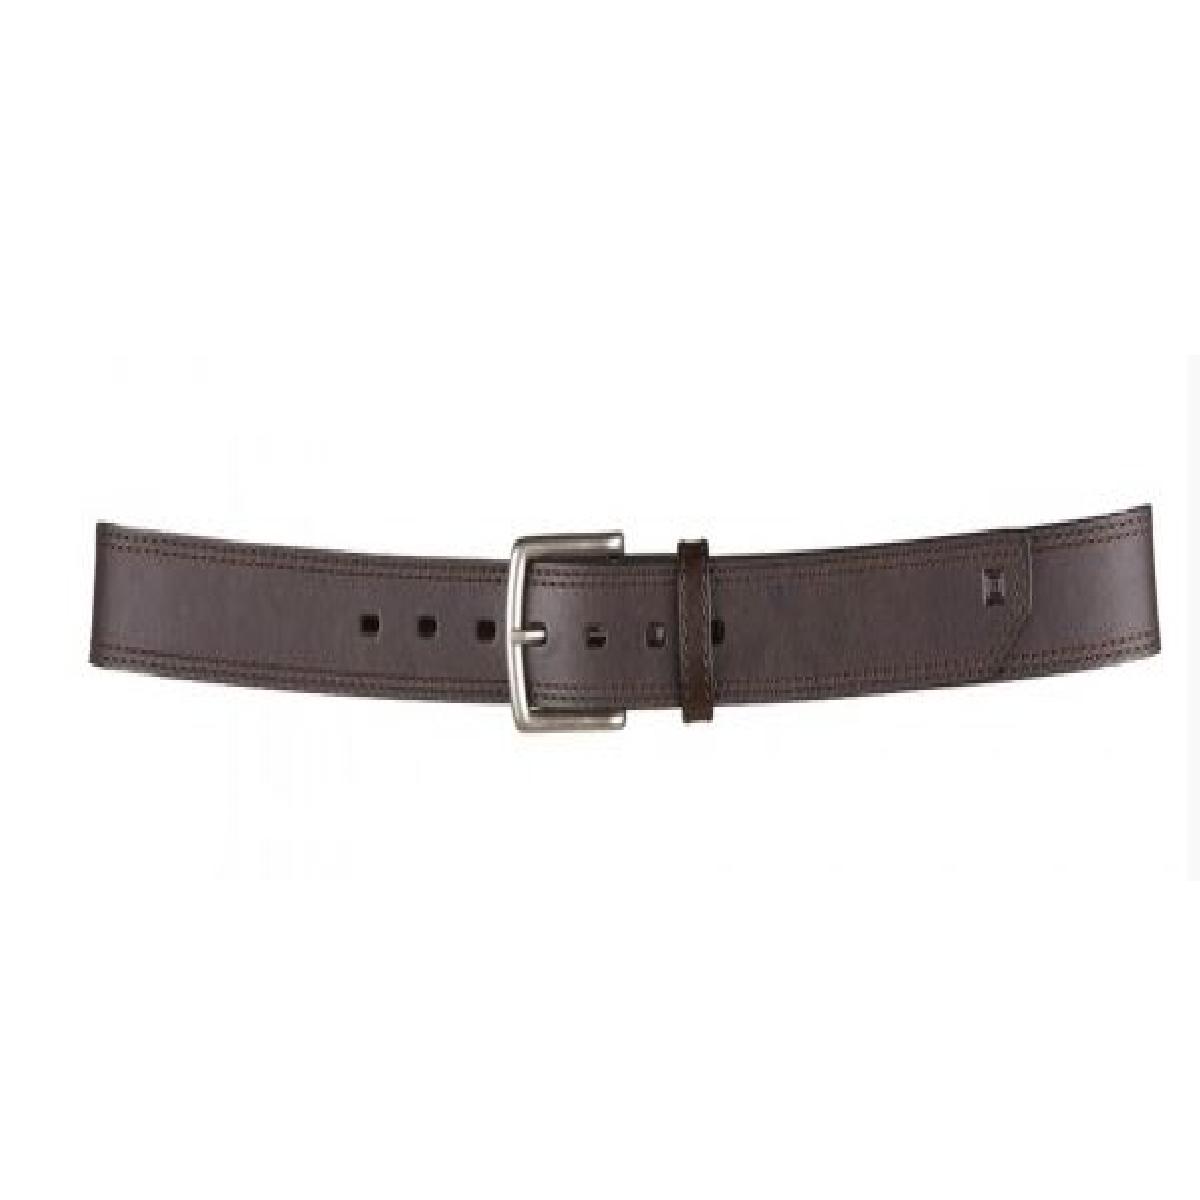 5 11 tactical series 59493 1 5 quot wide arc leather belt